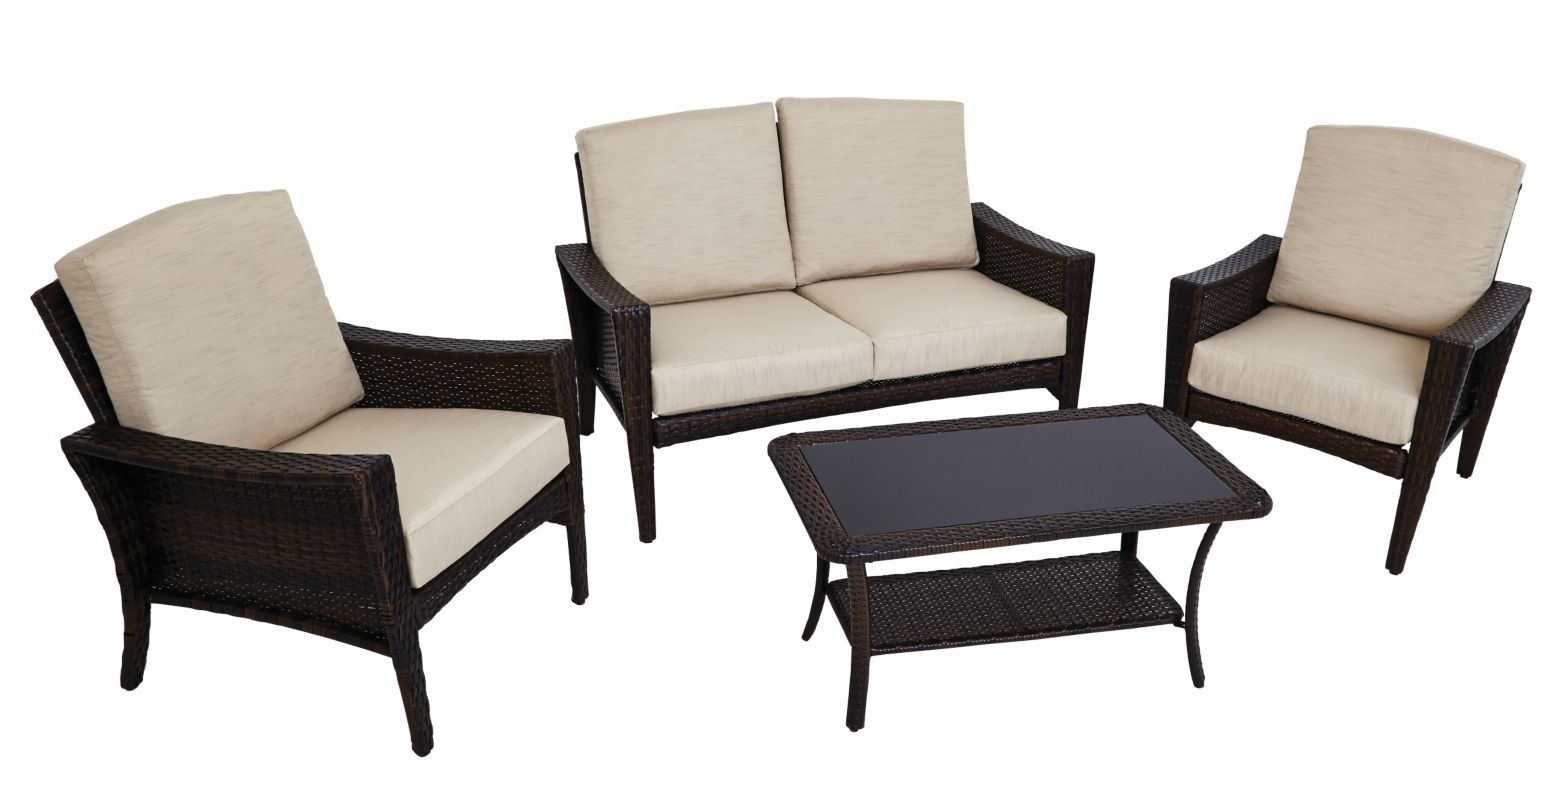 Borneo Garden Furniture Asda wyndham sofa set asda | goodca sofa